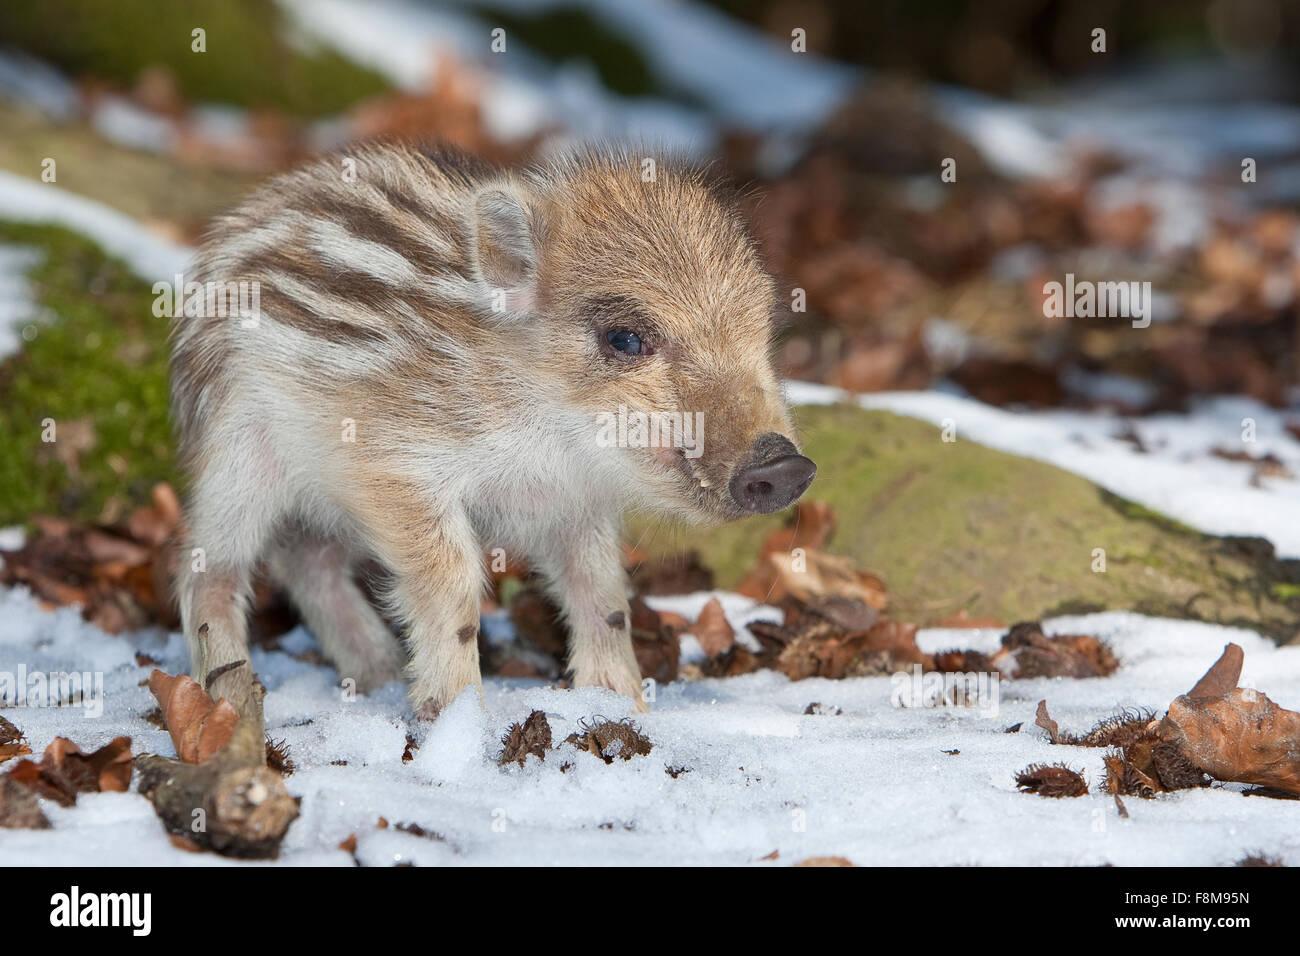 Wildschwein, Schwein, junge Wildschwein, Wildschwein, Schwarzwild, Frischling, Winter, Schnee, Jungtier, Tierbaby, Stockbild